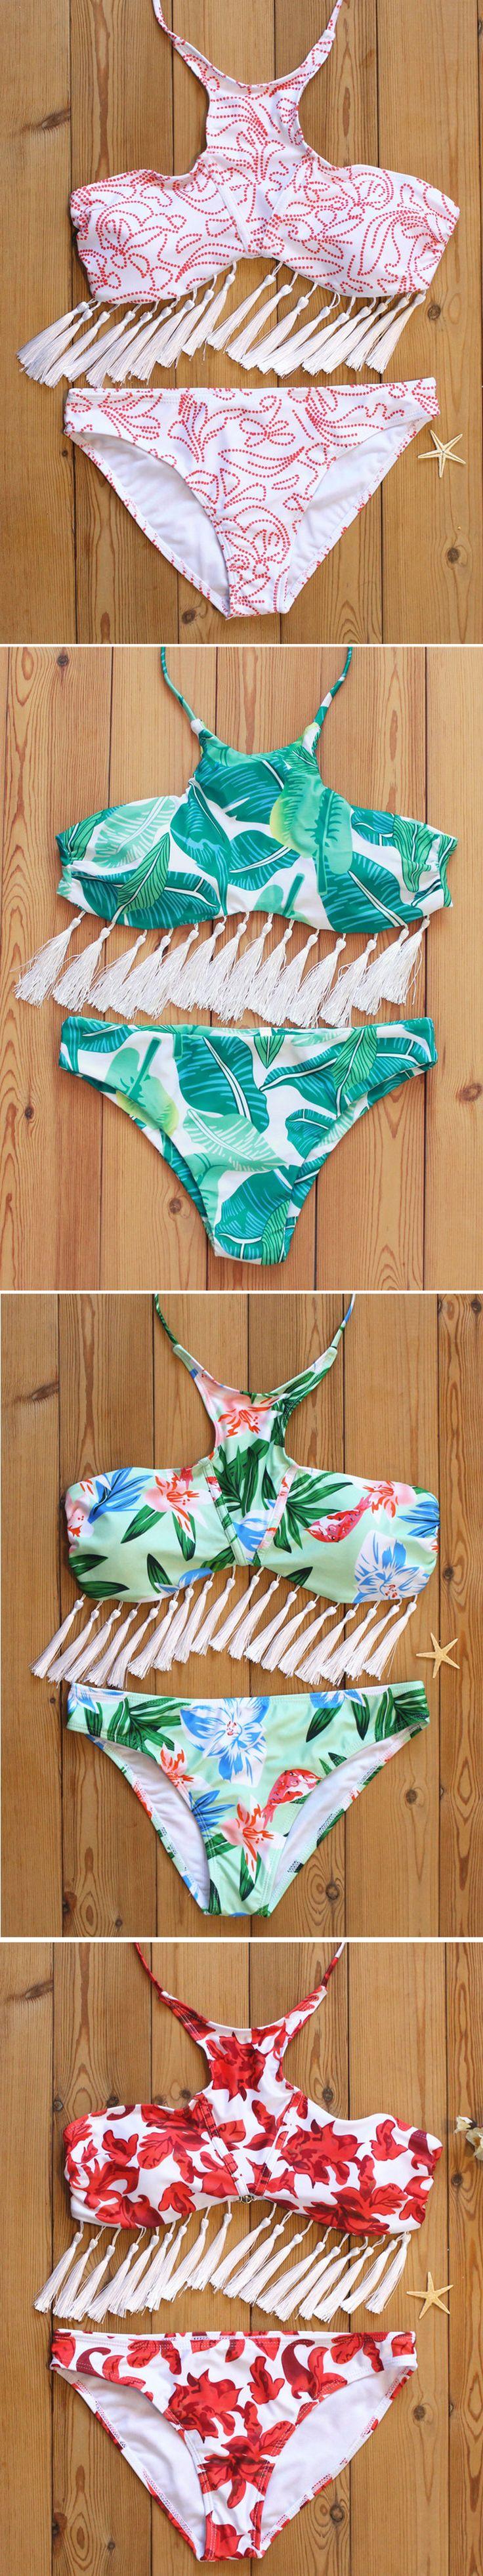 Sexy Tassel Halter Backless Printed Elastic Bikini Swimwear cool summer